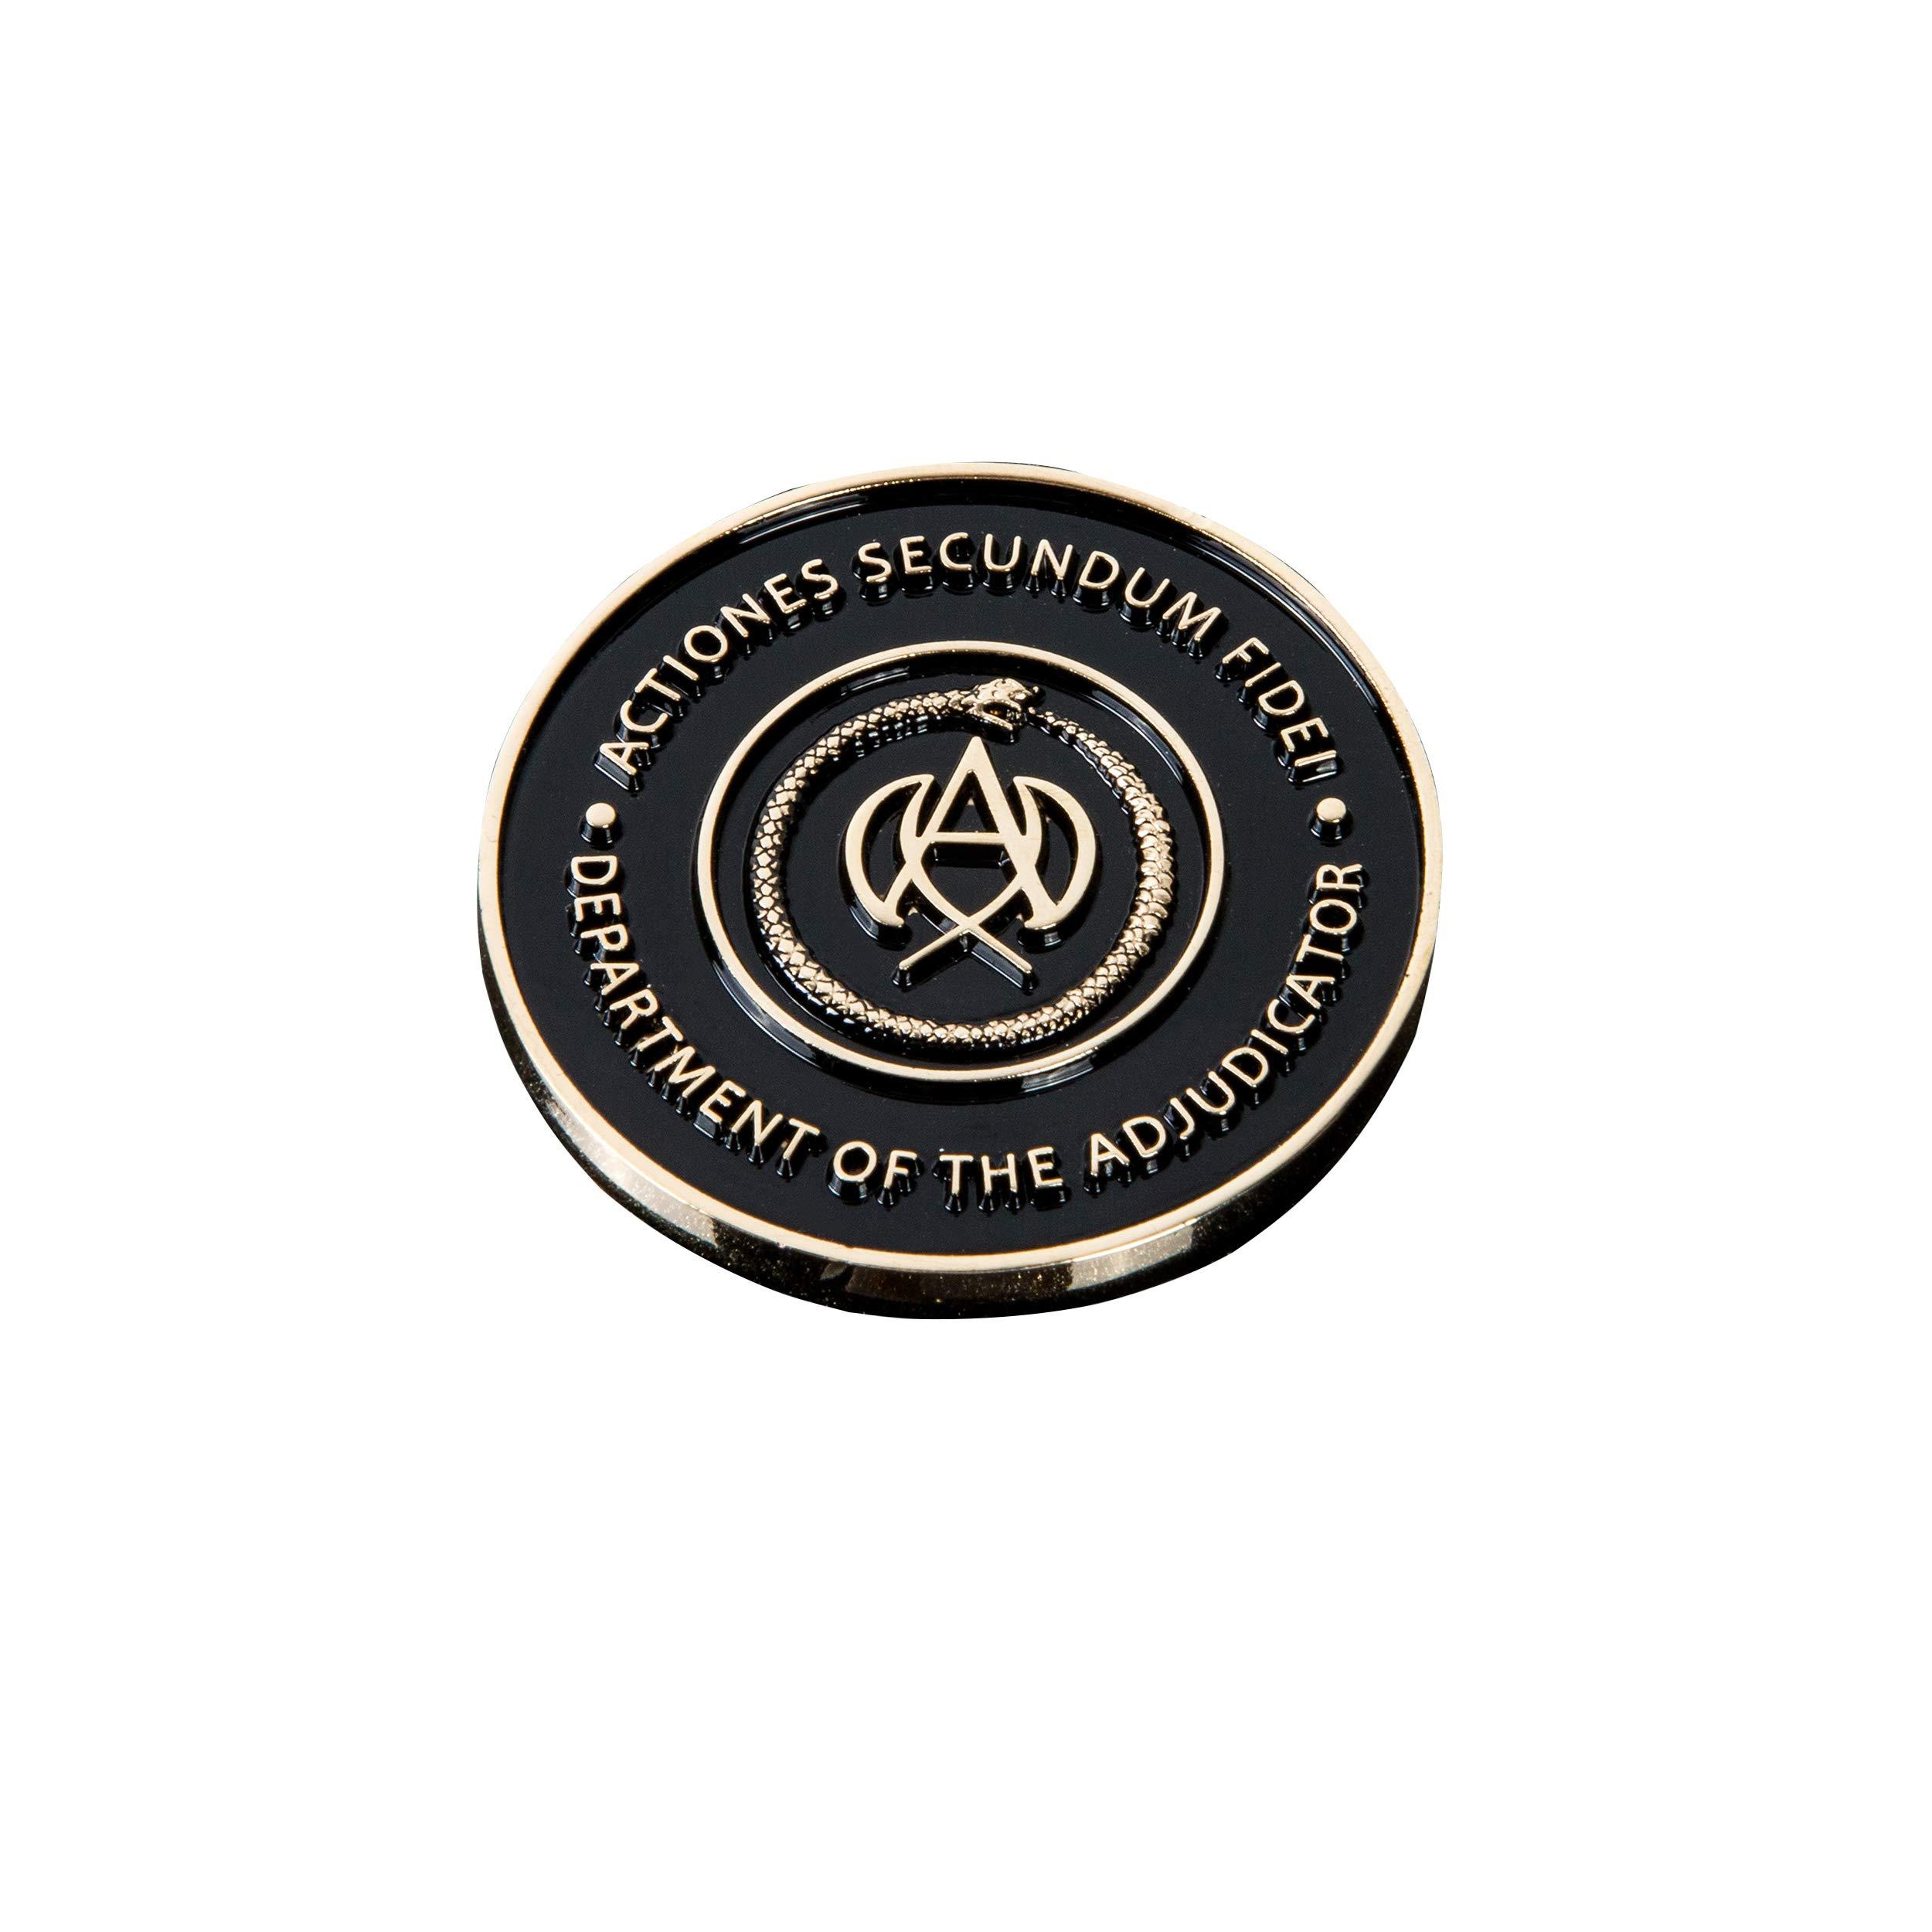 John Wick 3 Parabellum Collectible John Wick Prop Chapter 3 Keanu Reeves Cosplay Prop Accessories